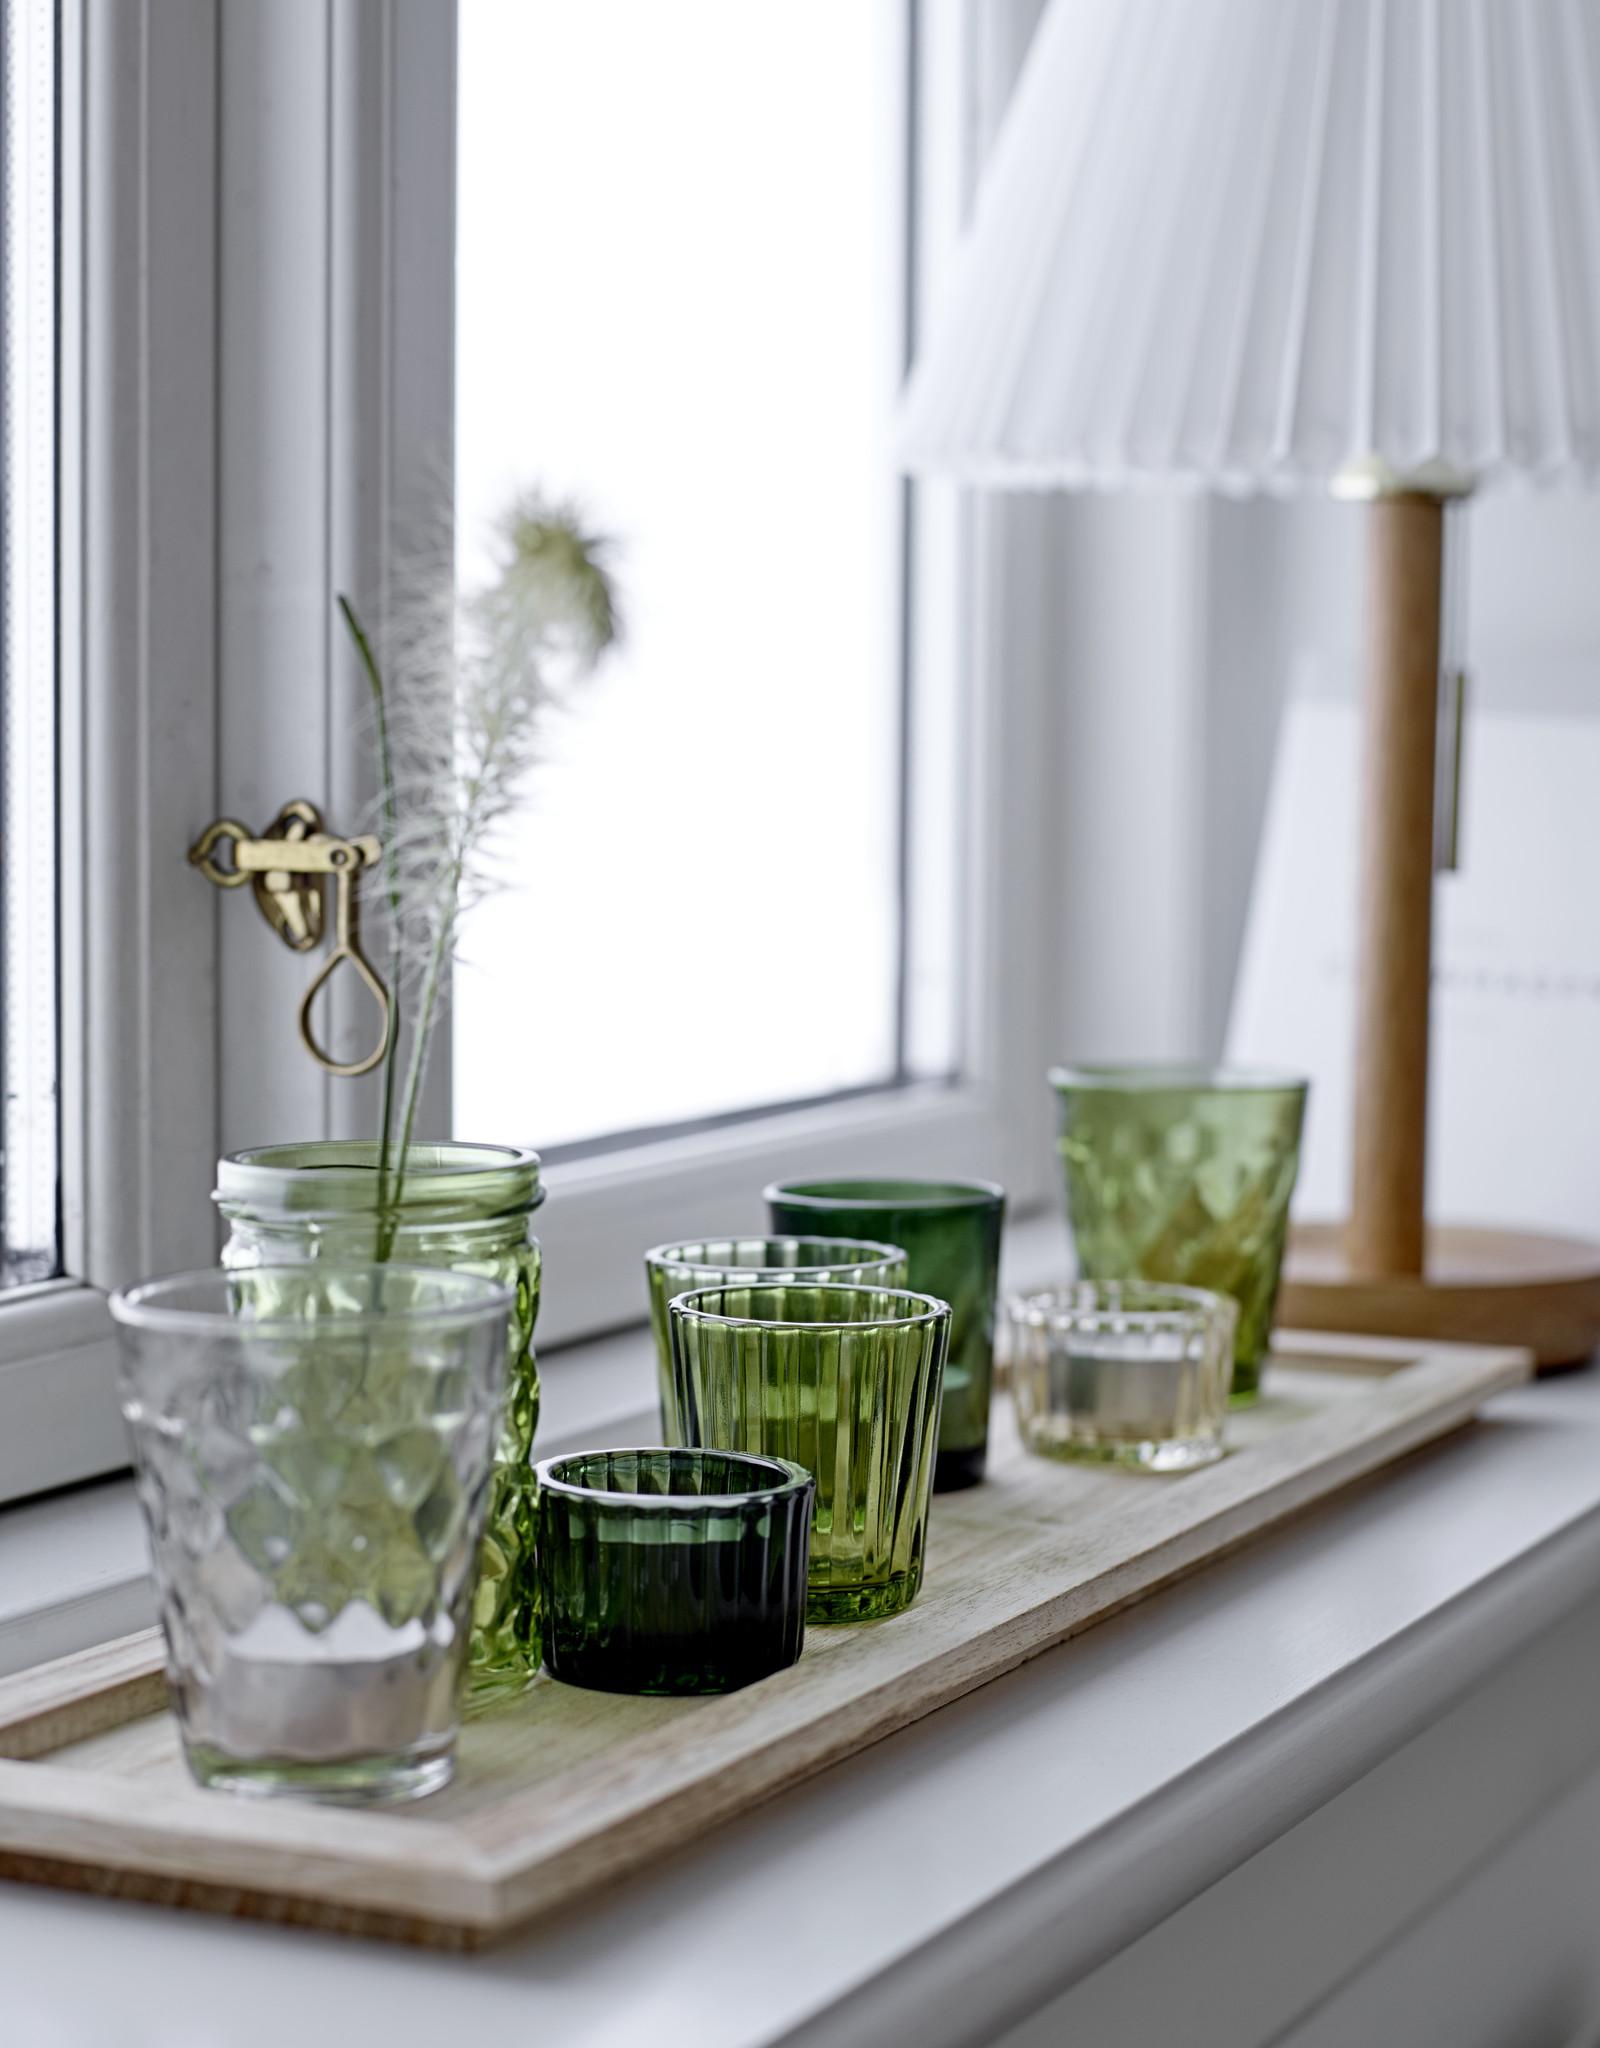 Bloomingville Bloomingville - Waxinelichtjes - Glas/Hout - Groen - set van 9 - L50xH11xB14 cm